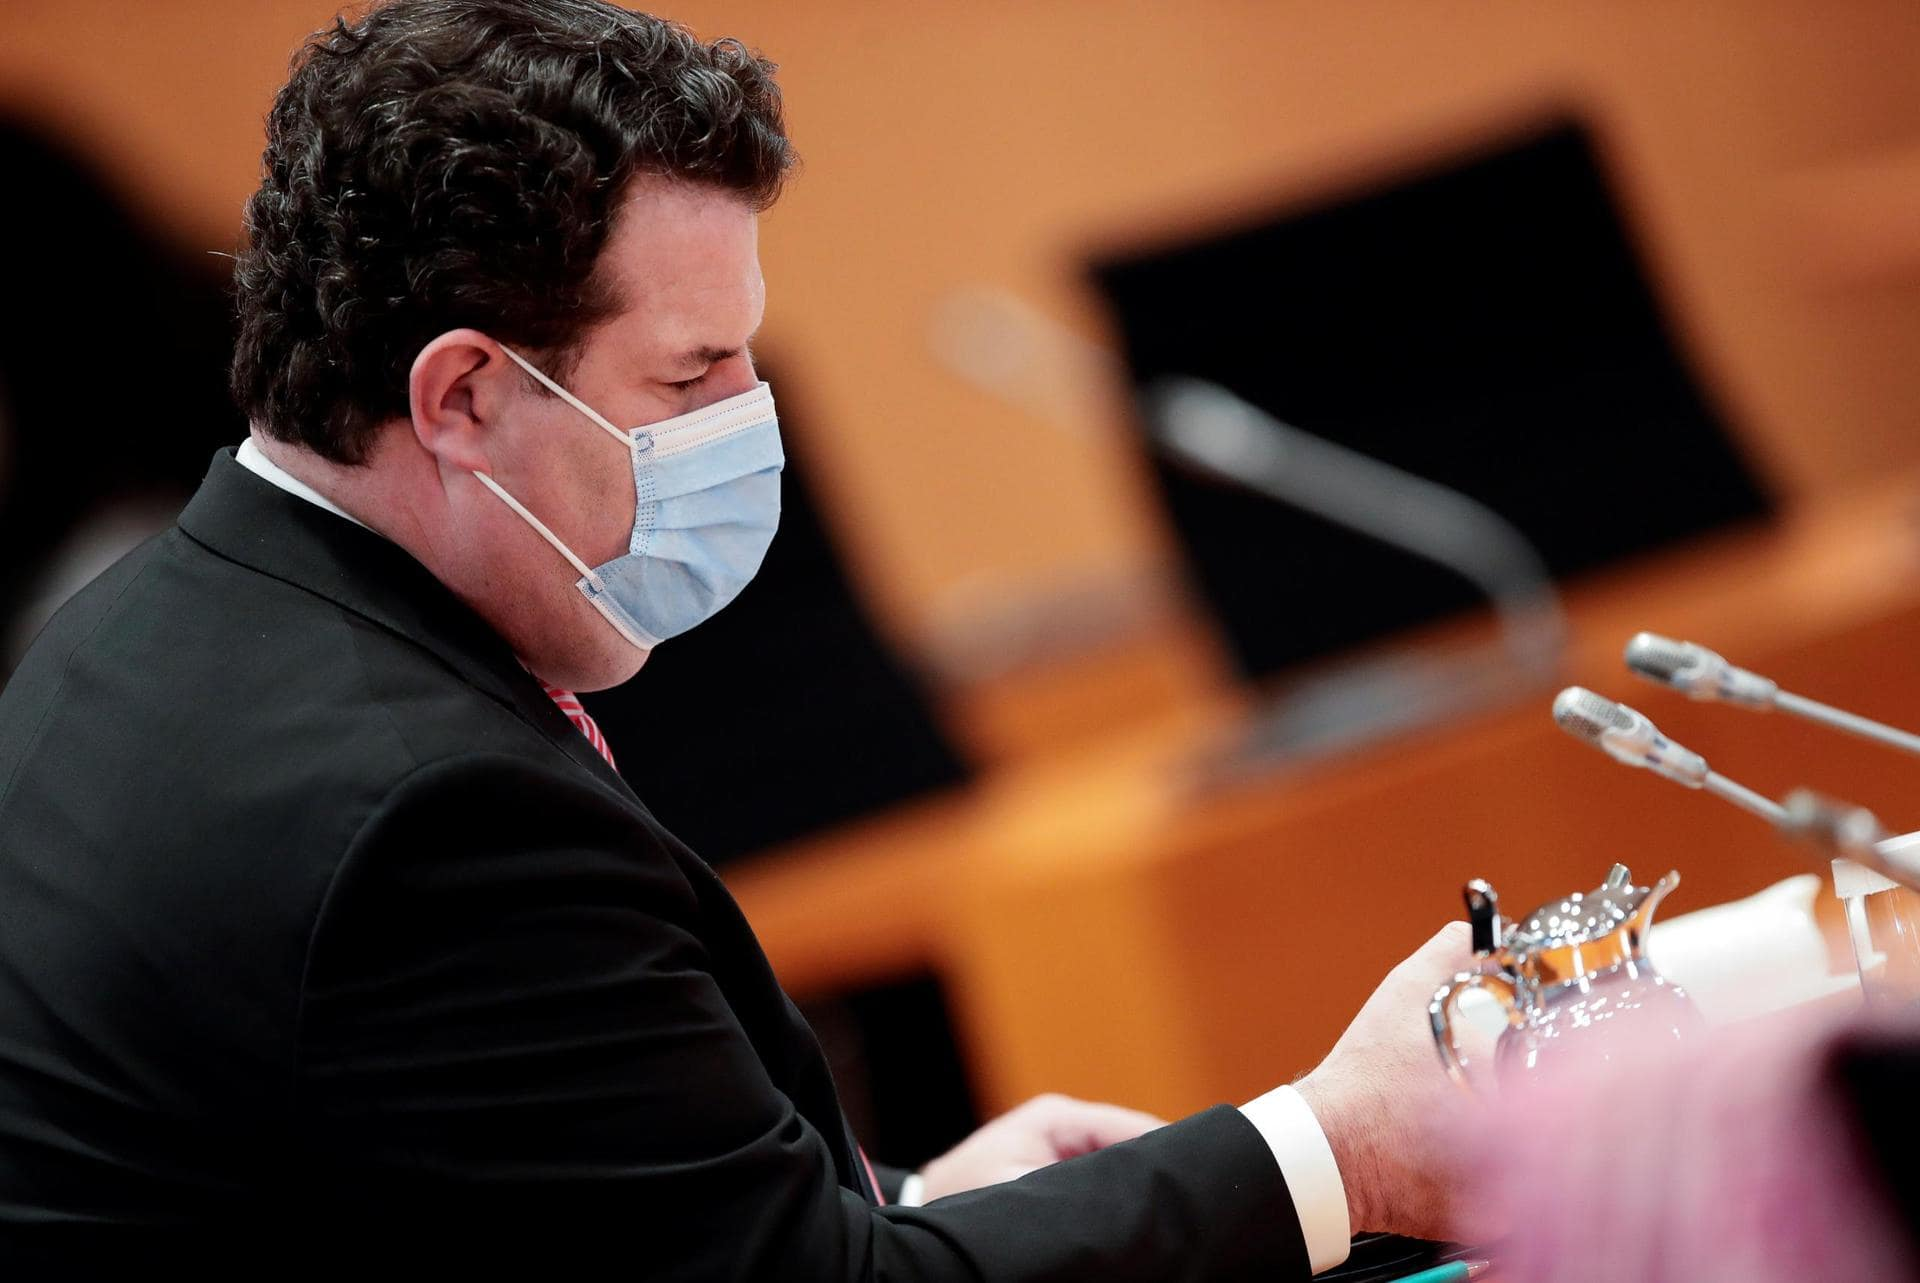 Firmen müssen Beschäftigten Coronatests anbieten Pandemie